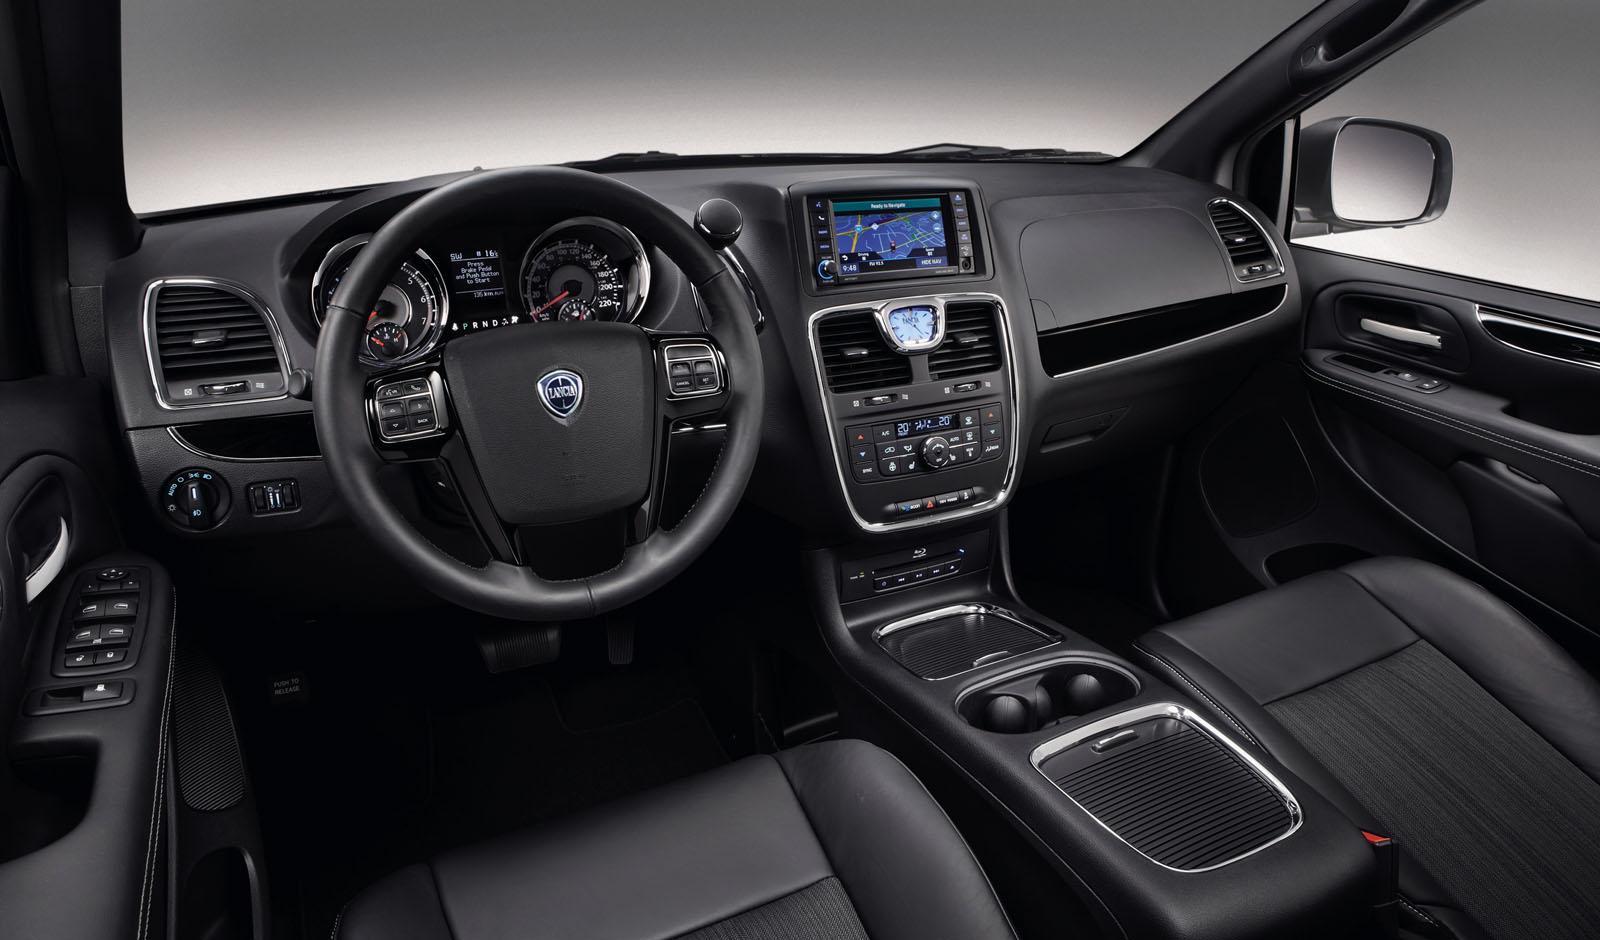 2018 Nissan 370z Nismo >> 2014 Lancia Voyager S Revealed Ahead of Frankfurt Debut ...